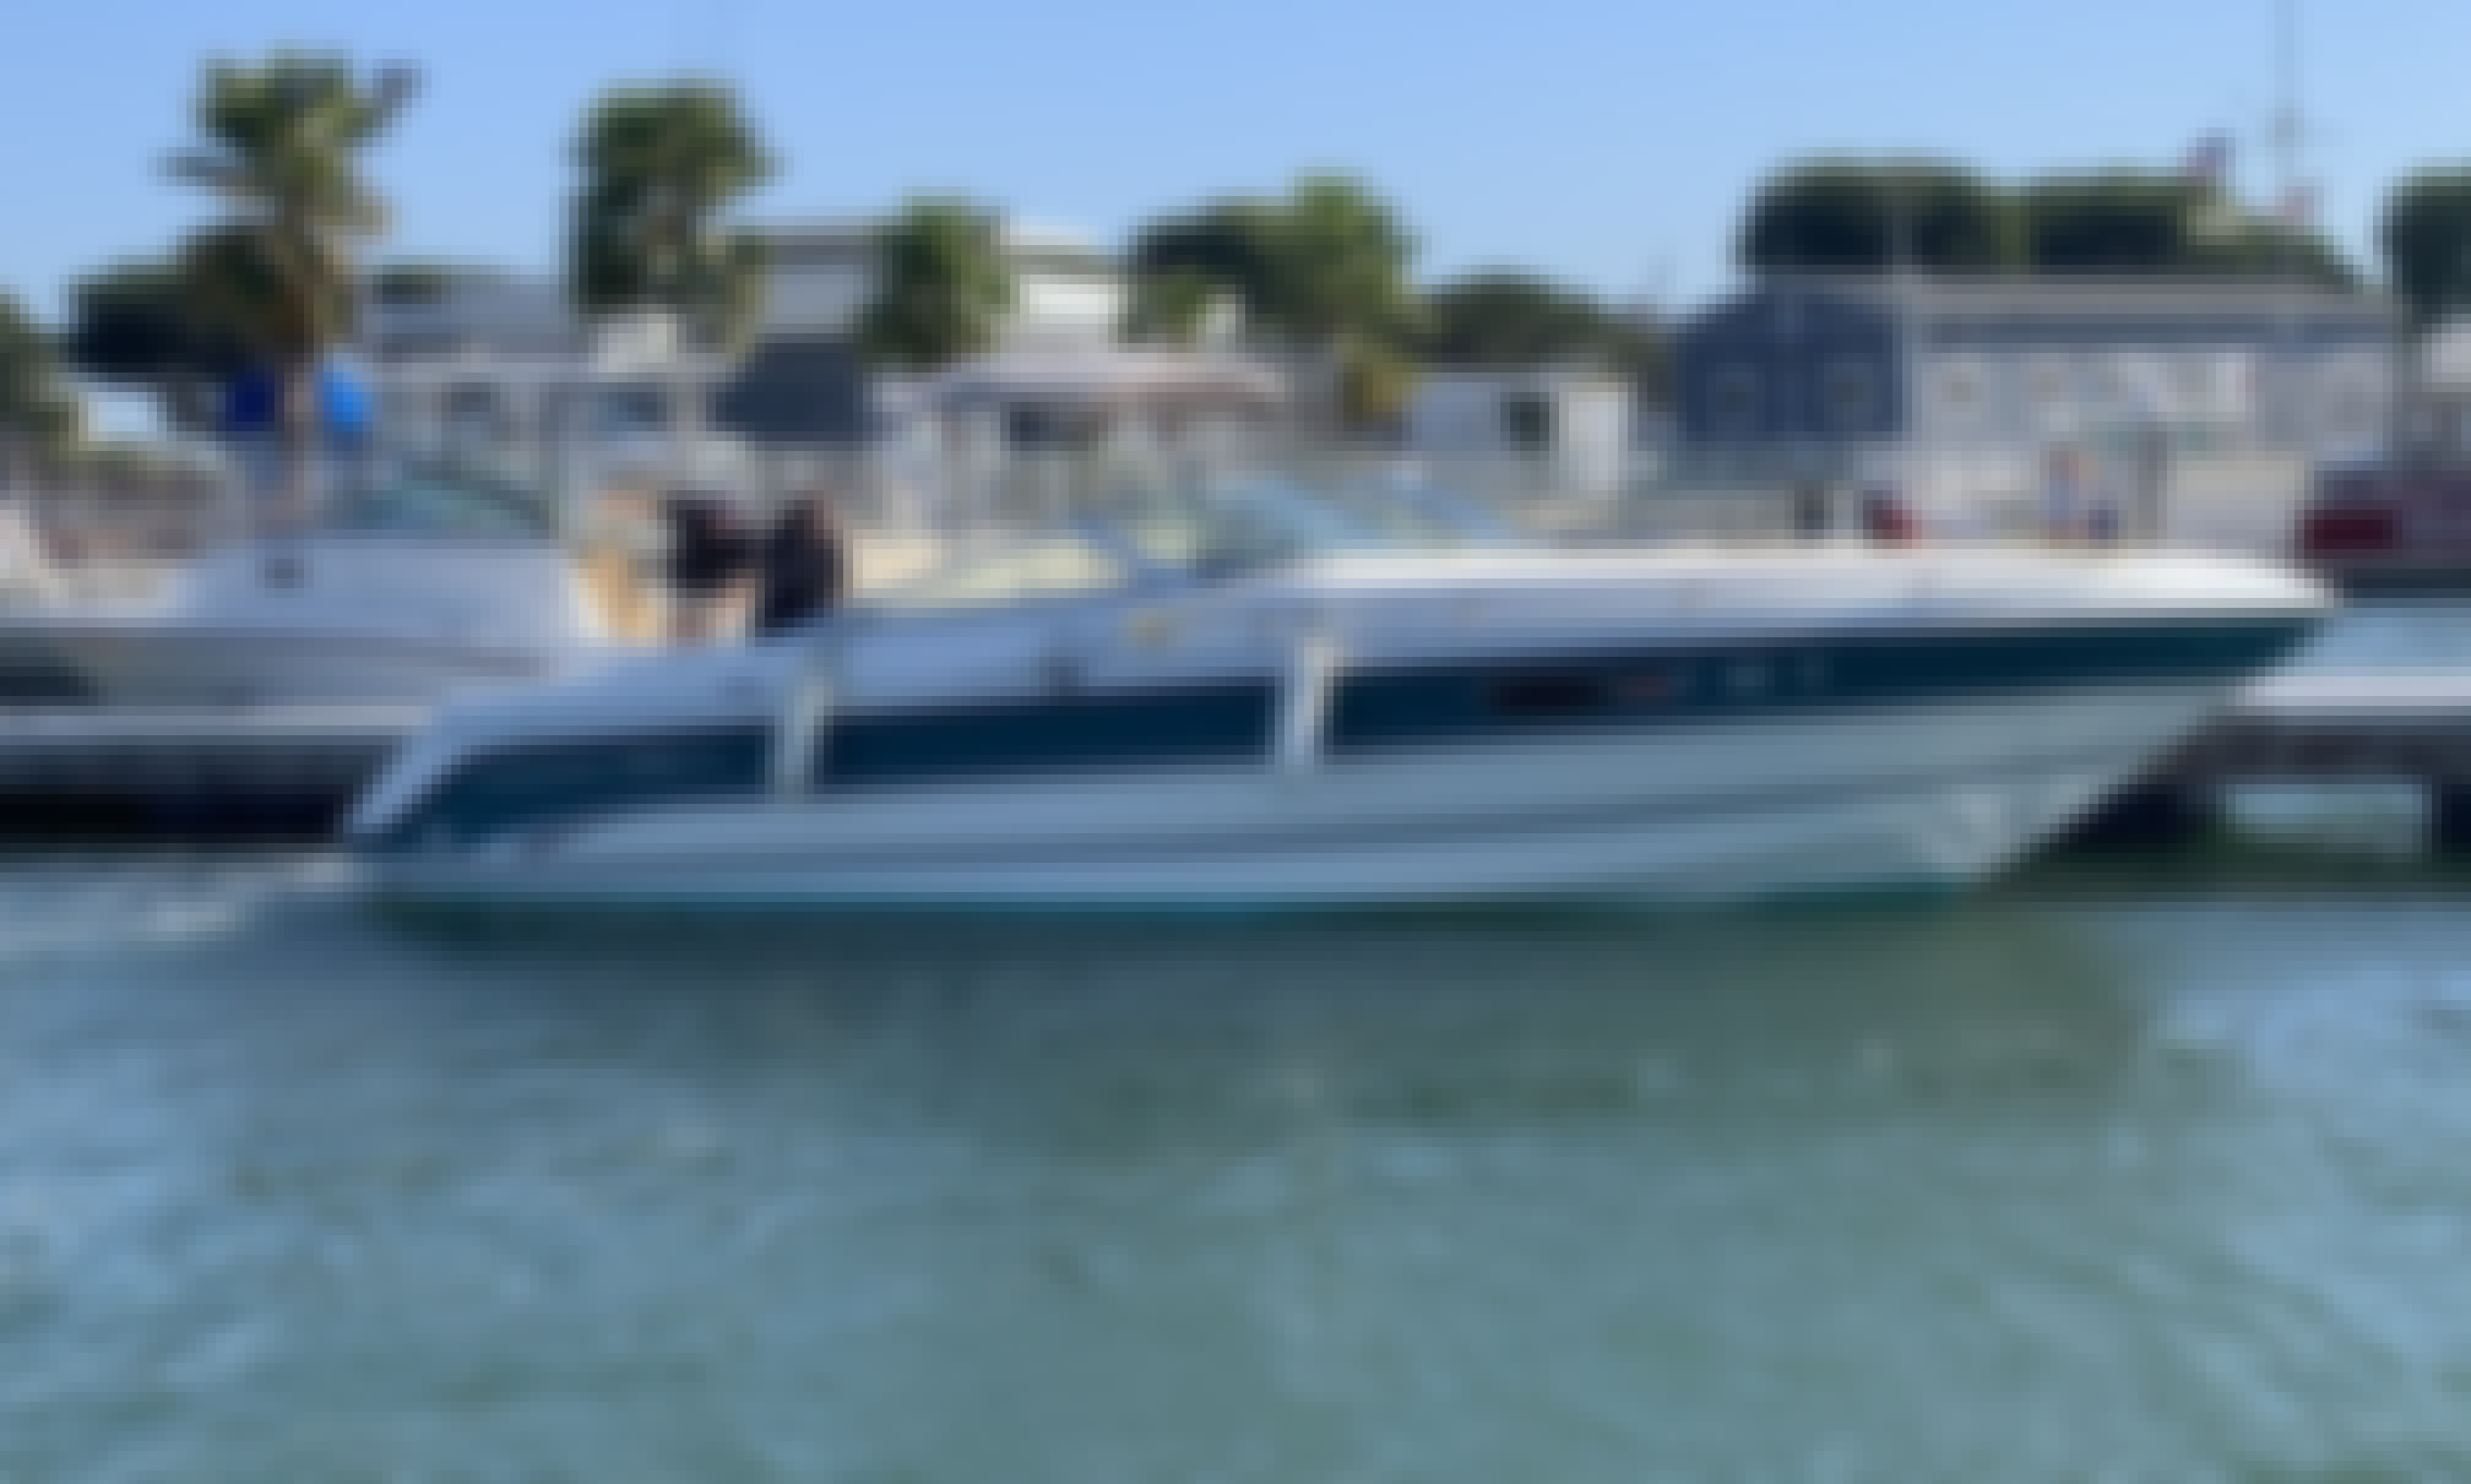 $𝟏𝟕𝟓 🅿🅴🆁 🅷🅾🆄🆁 MIN 3 HRS Chaparral 2550SX Motor Yacht Rental in Newport Beach California